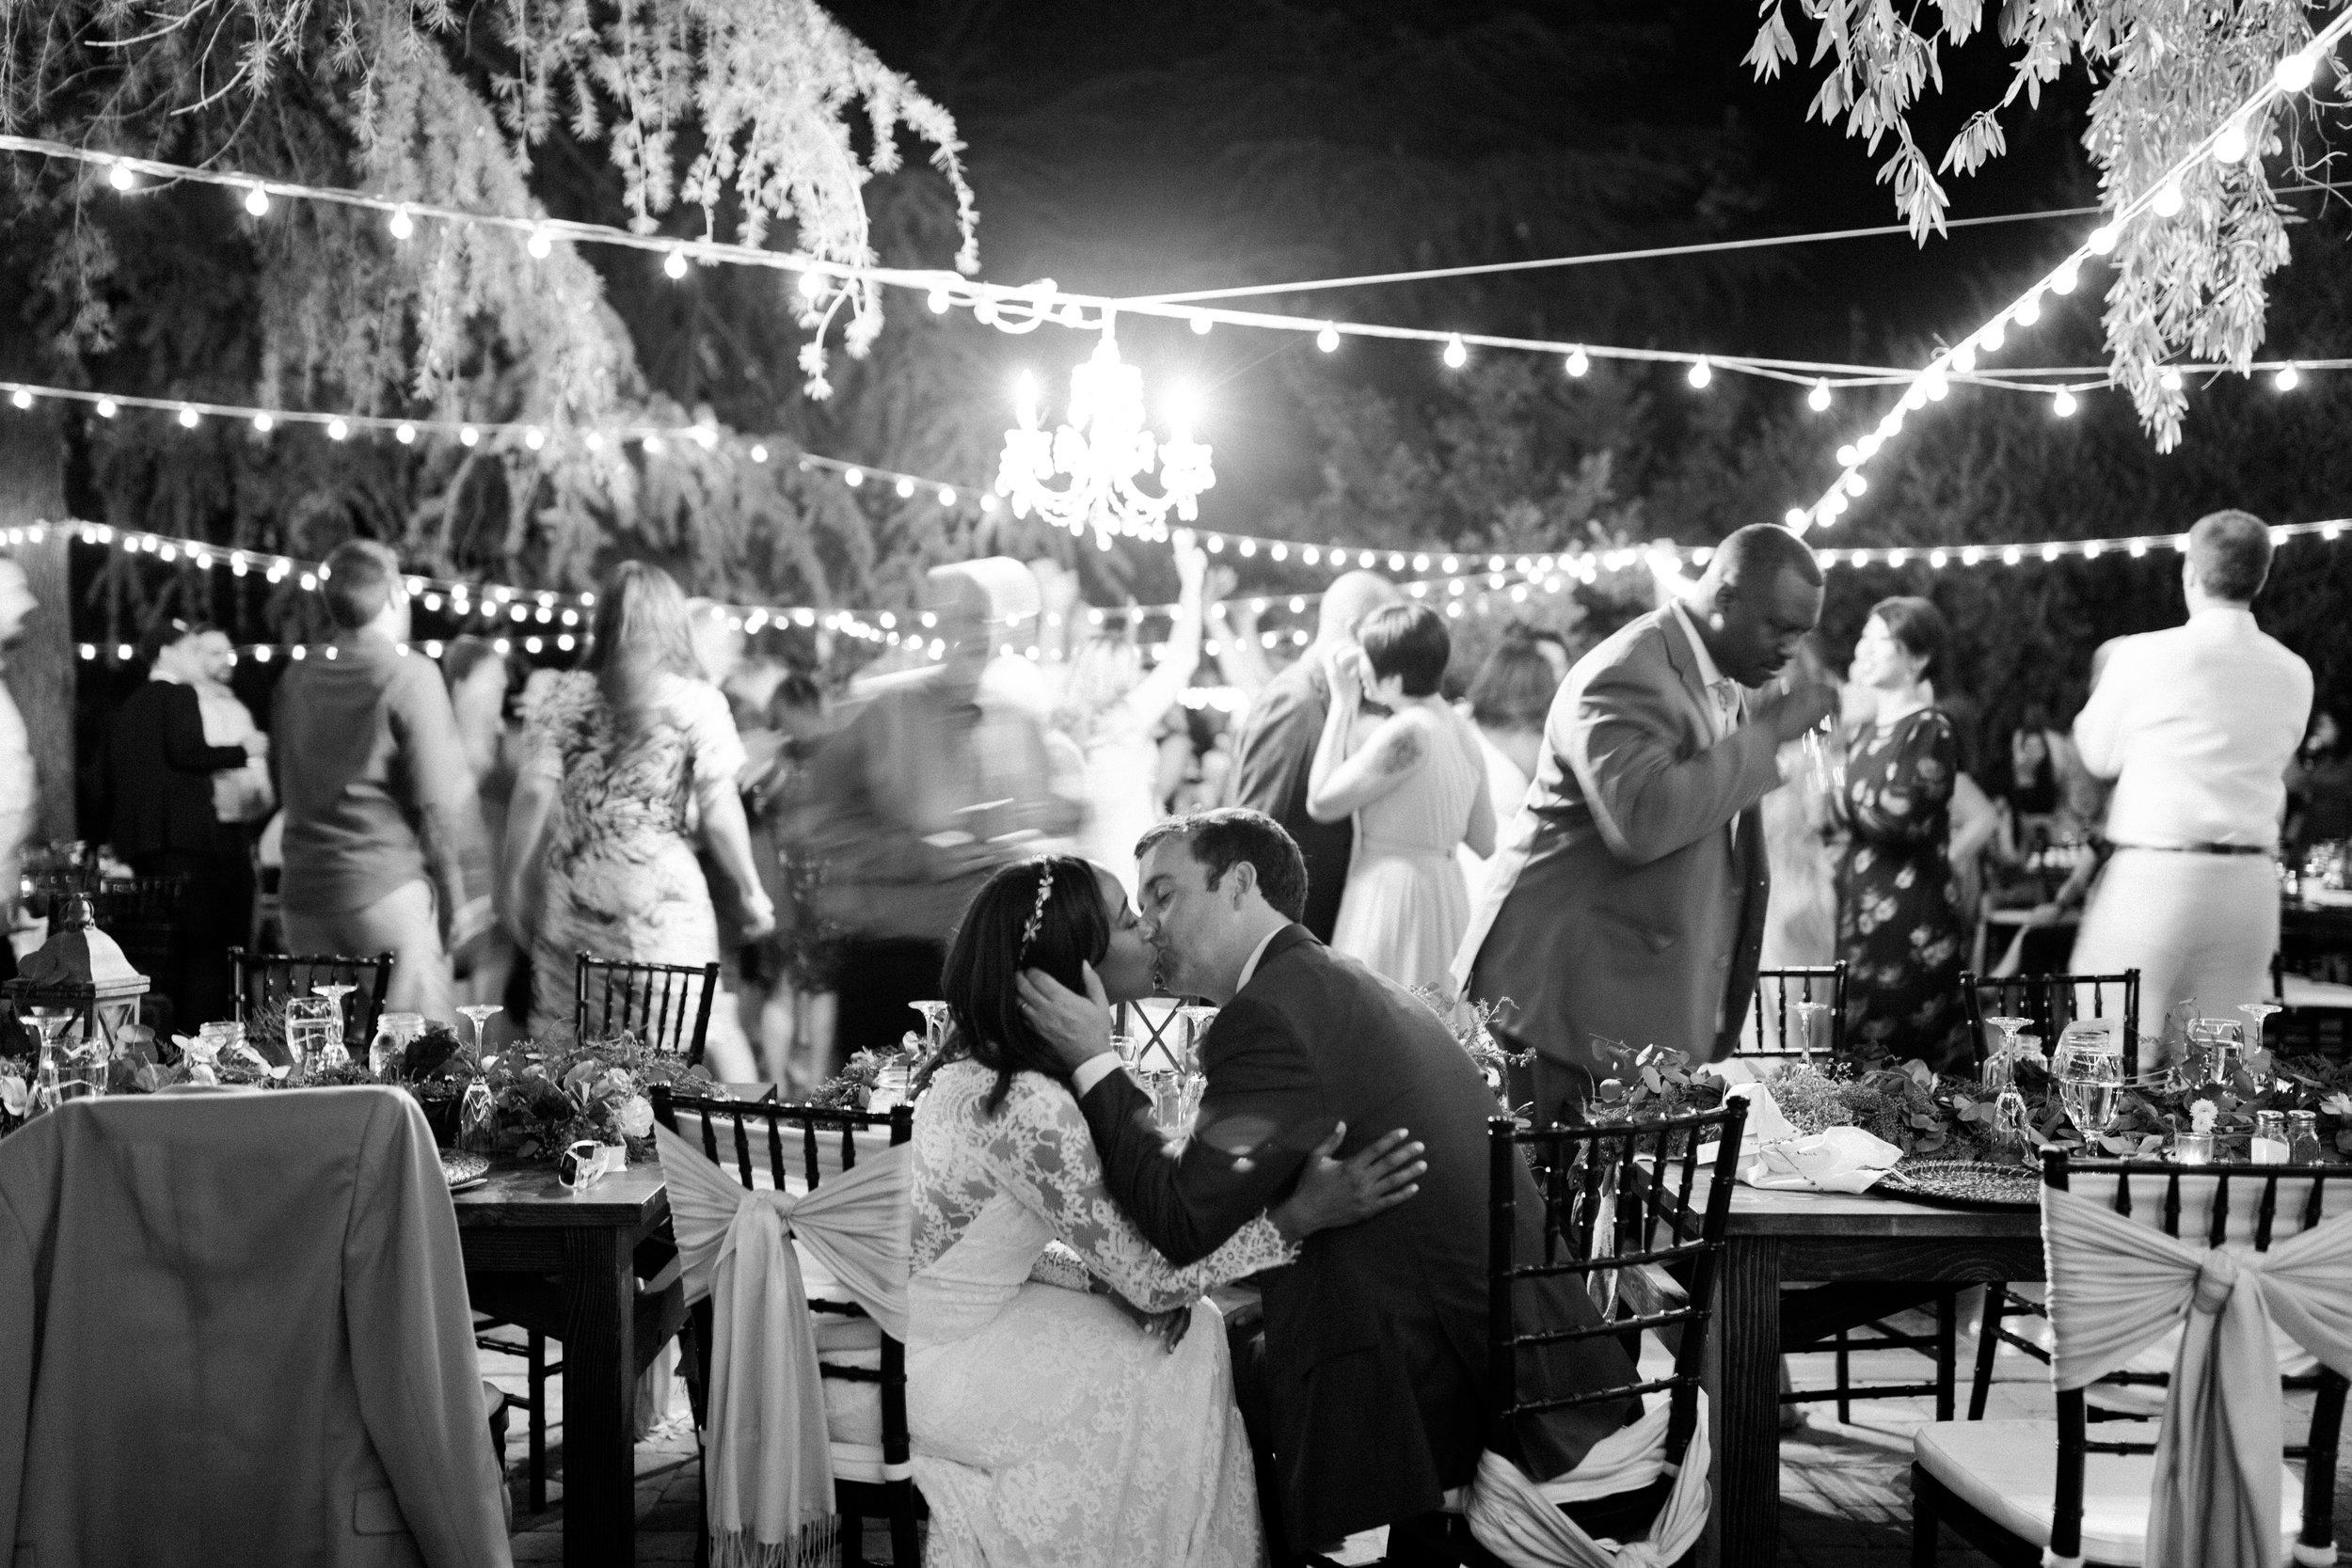 Jenny Quicksall Photography_www.jennyquicksall.com_California Wedding Photographer_Highland Springs Ranch and Inn Resort_Cherry Valley California (94).JPG